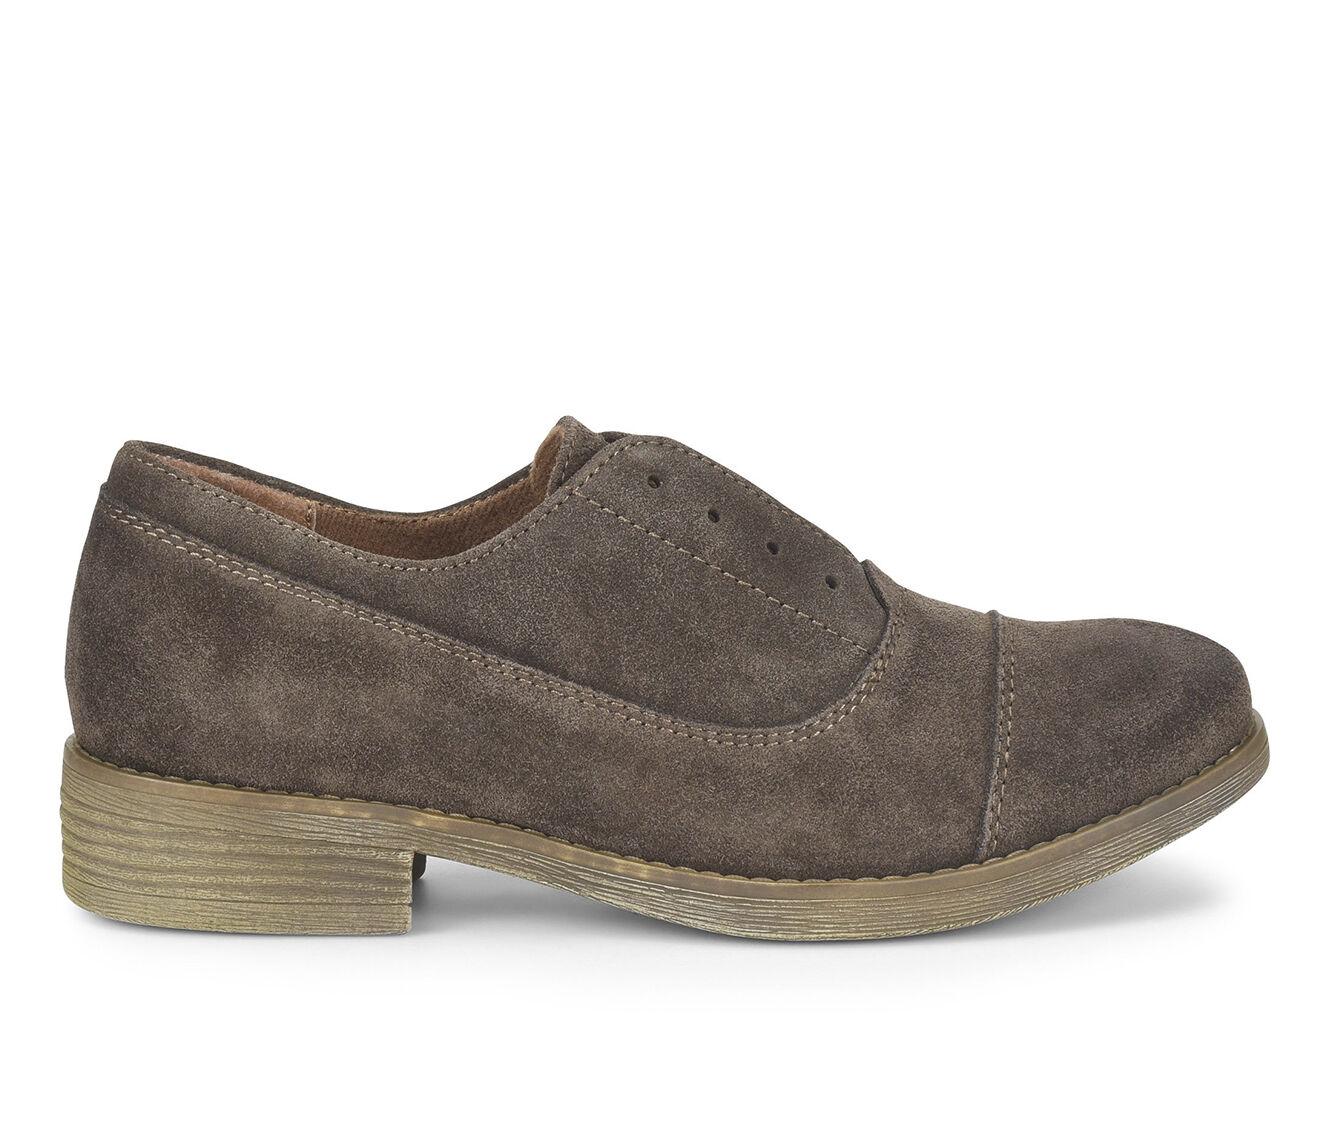 Women's EuroSoft Tanya Shoes Ebano